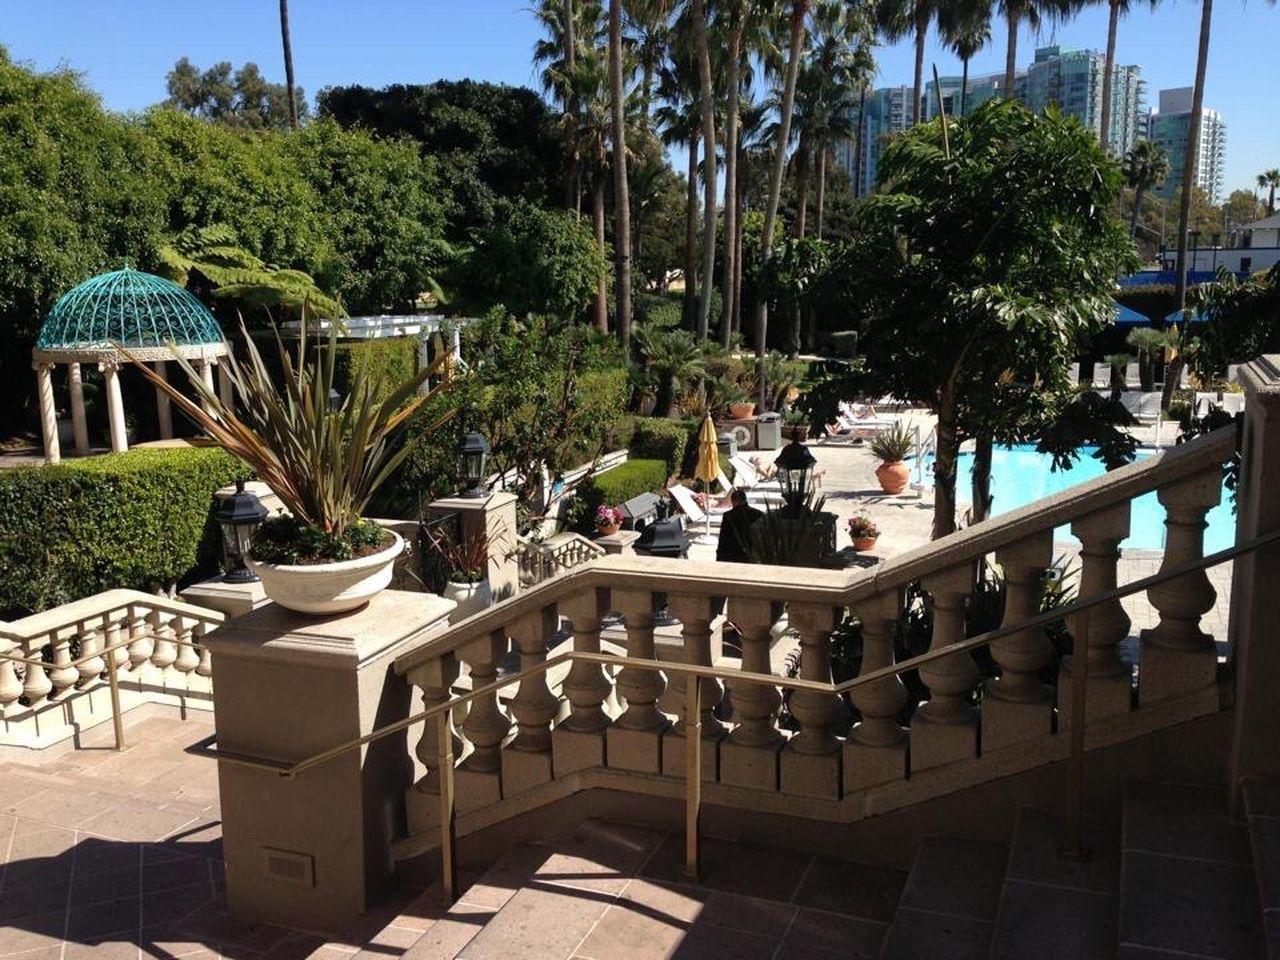 California Marina The Ritz-Carlton Pool Tropical Garden Stairs Courtyard